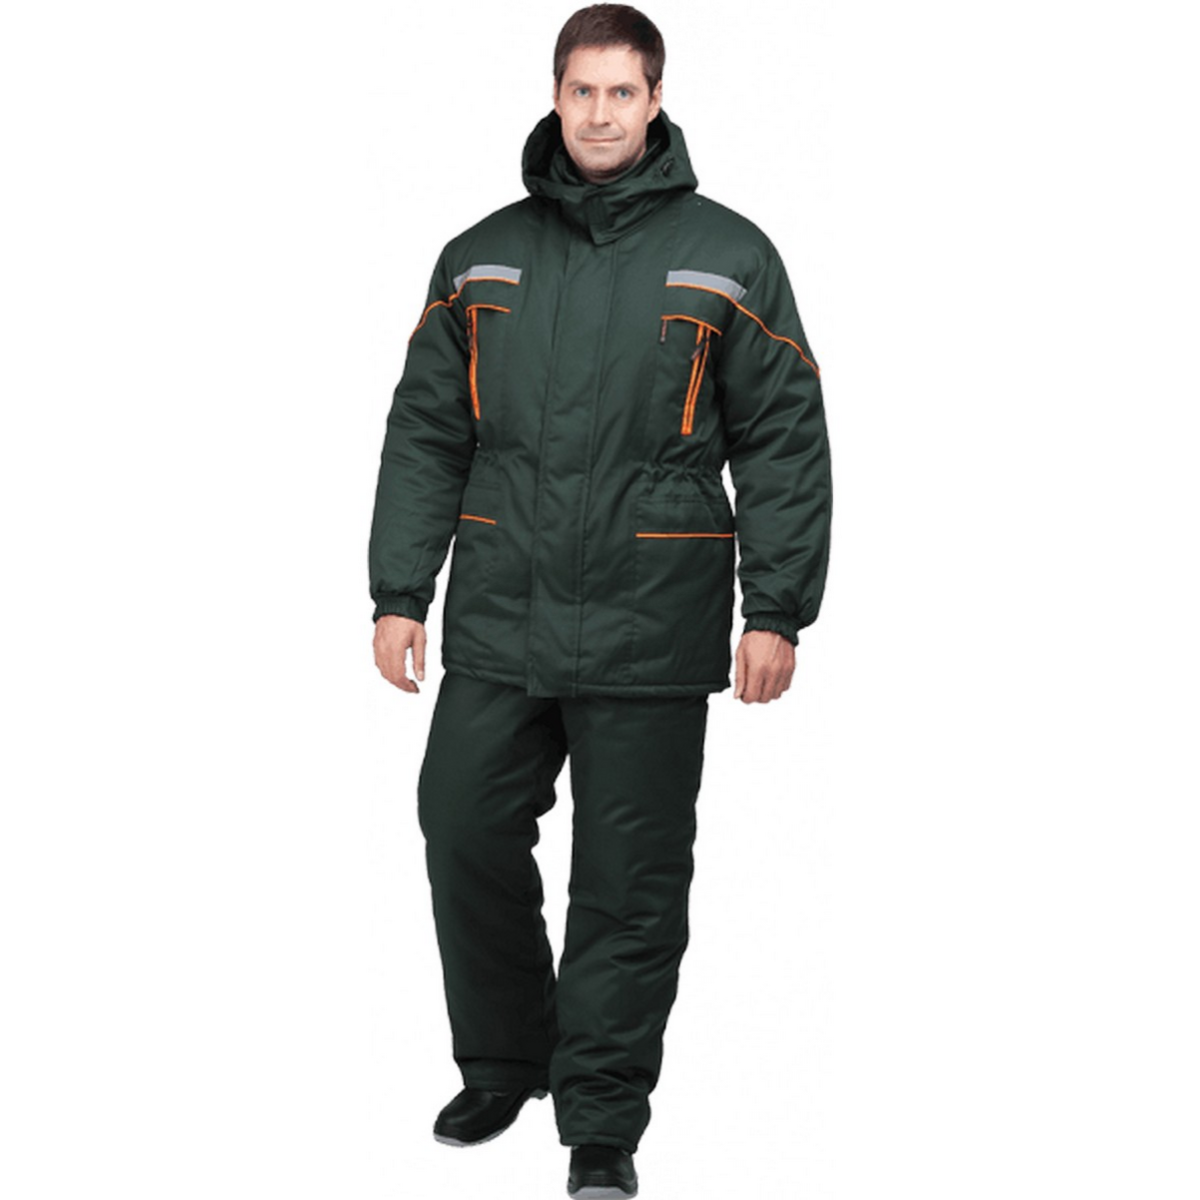 Куртка ЛАНДШАФТ утепленная зеленый (разм. 88-92 рост 170-176)